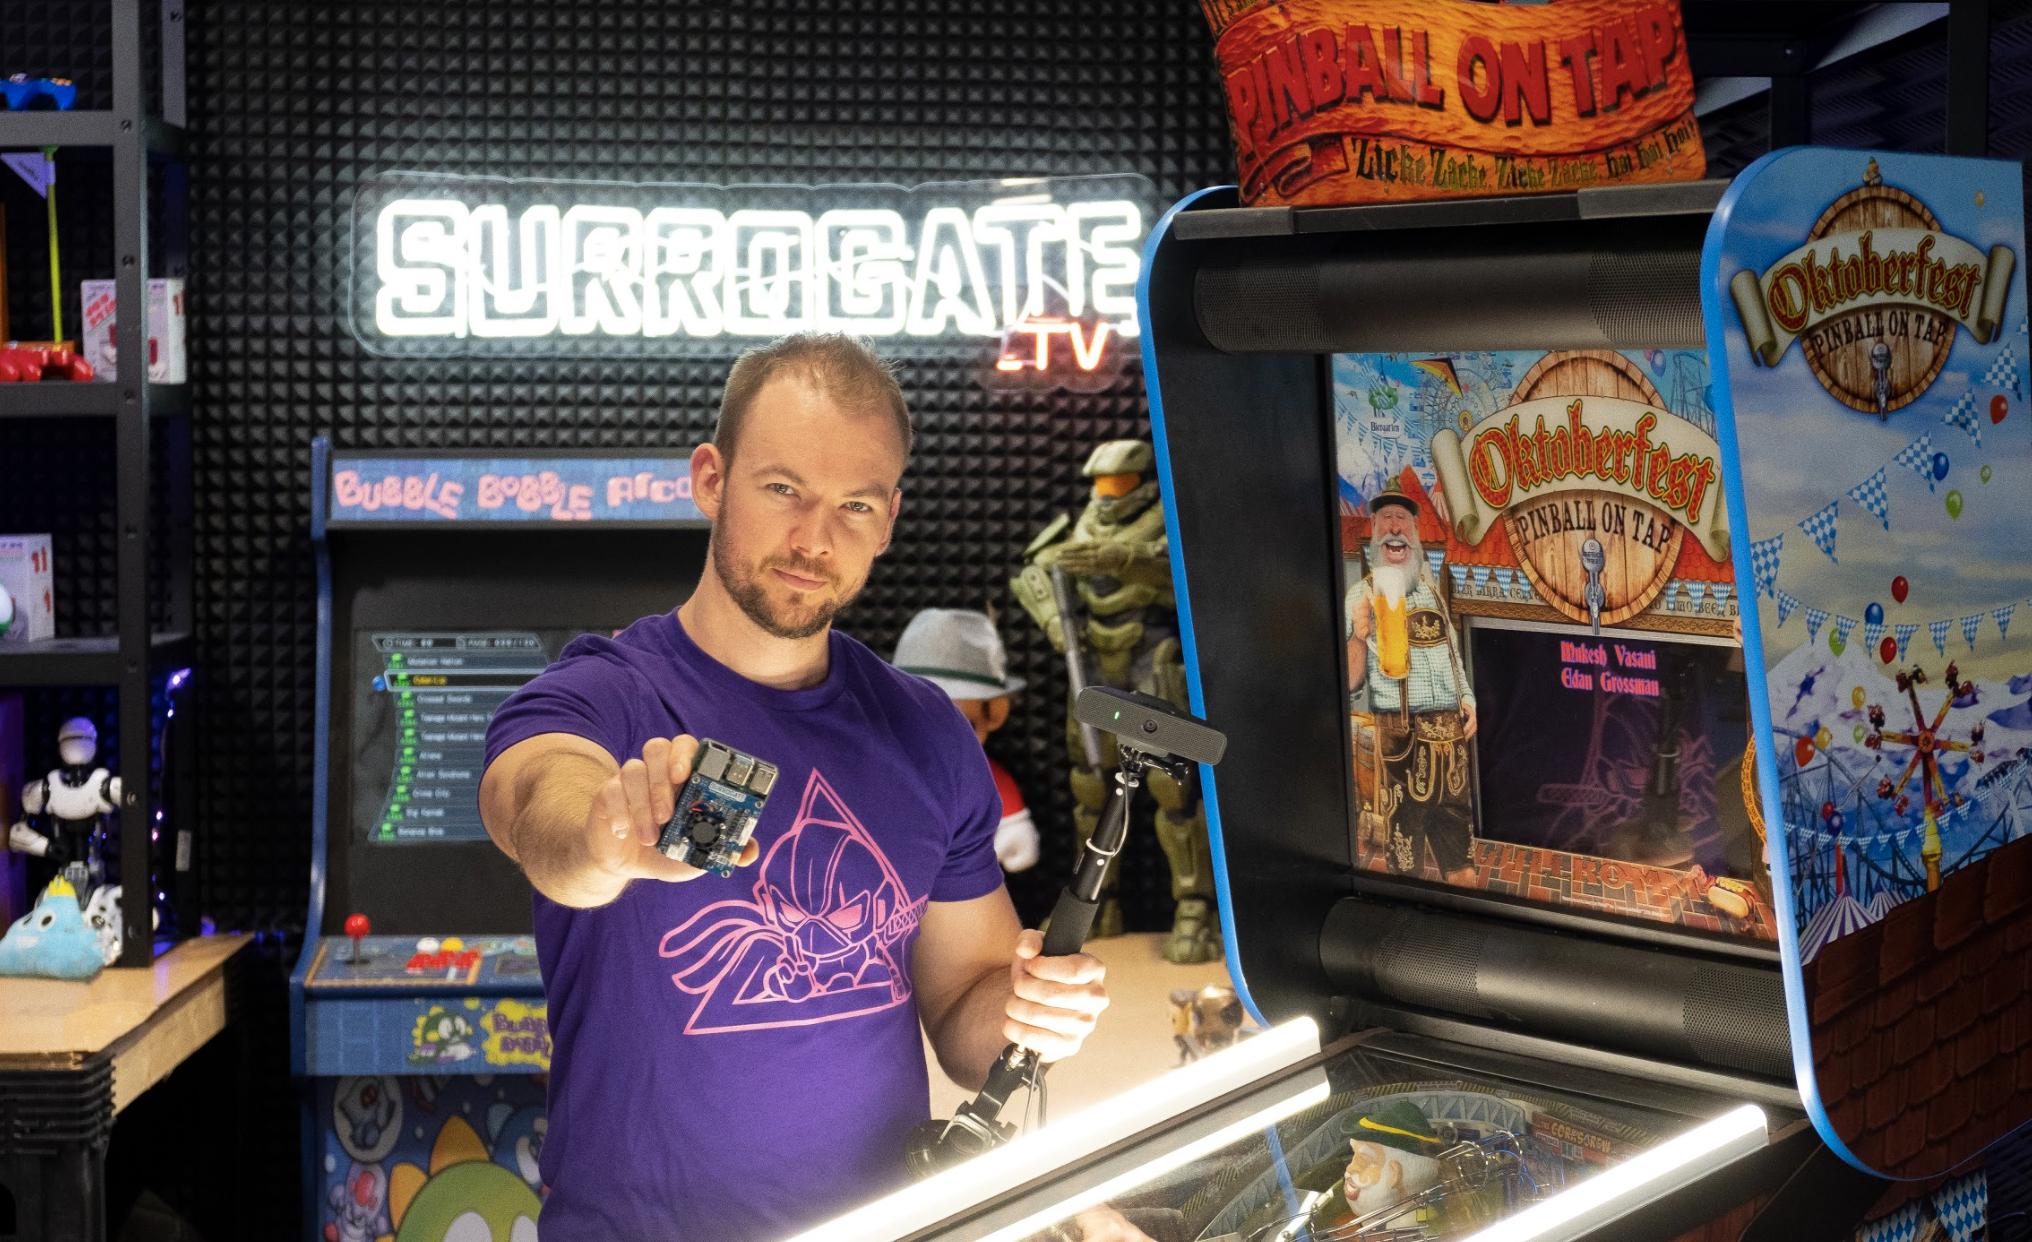 surrogate.tv oktoberfest pinball machine